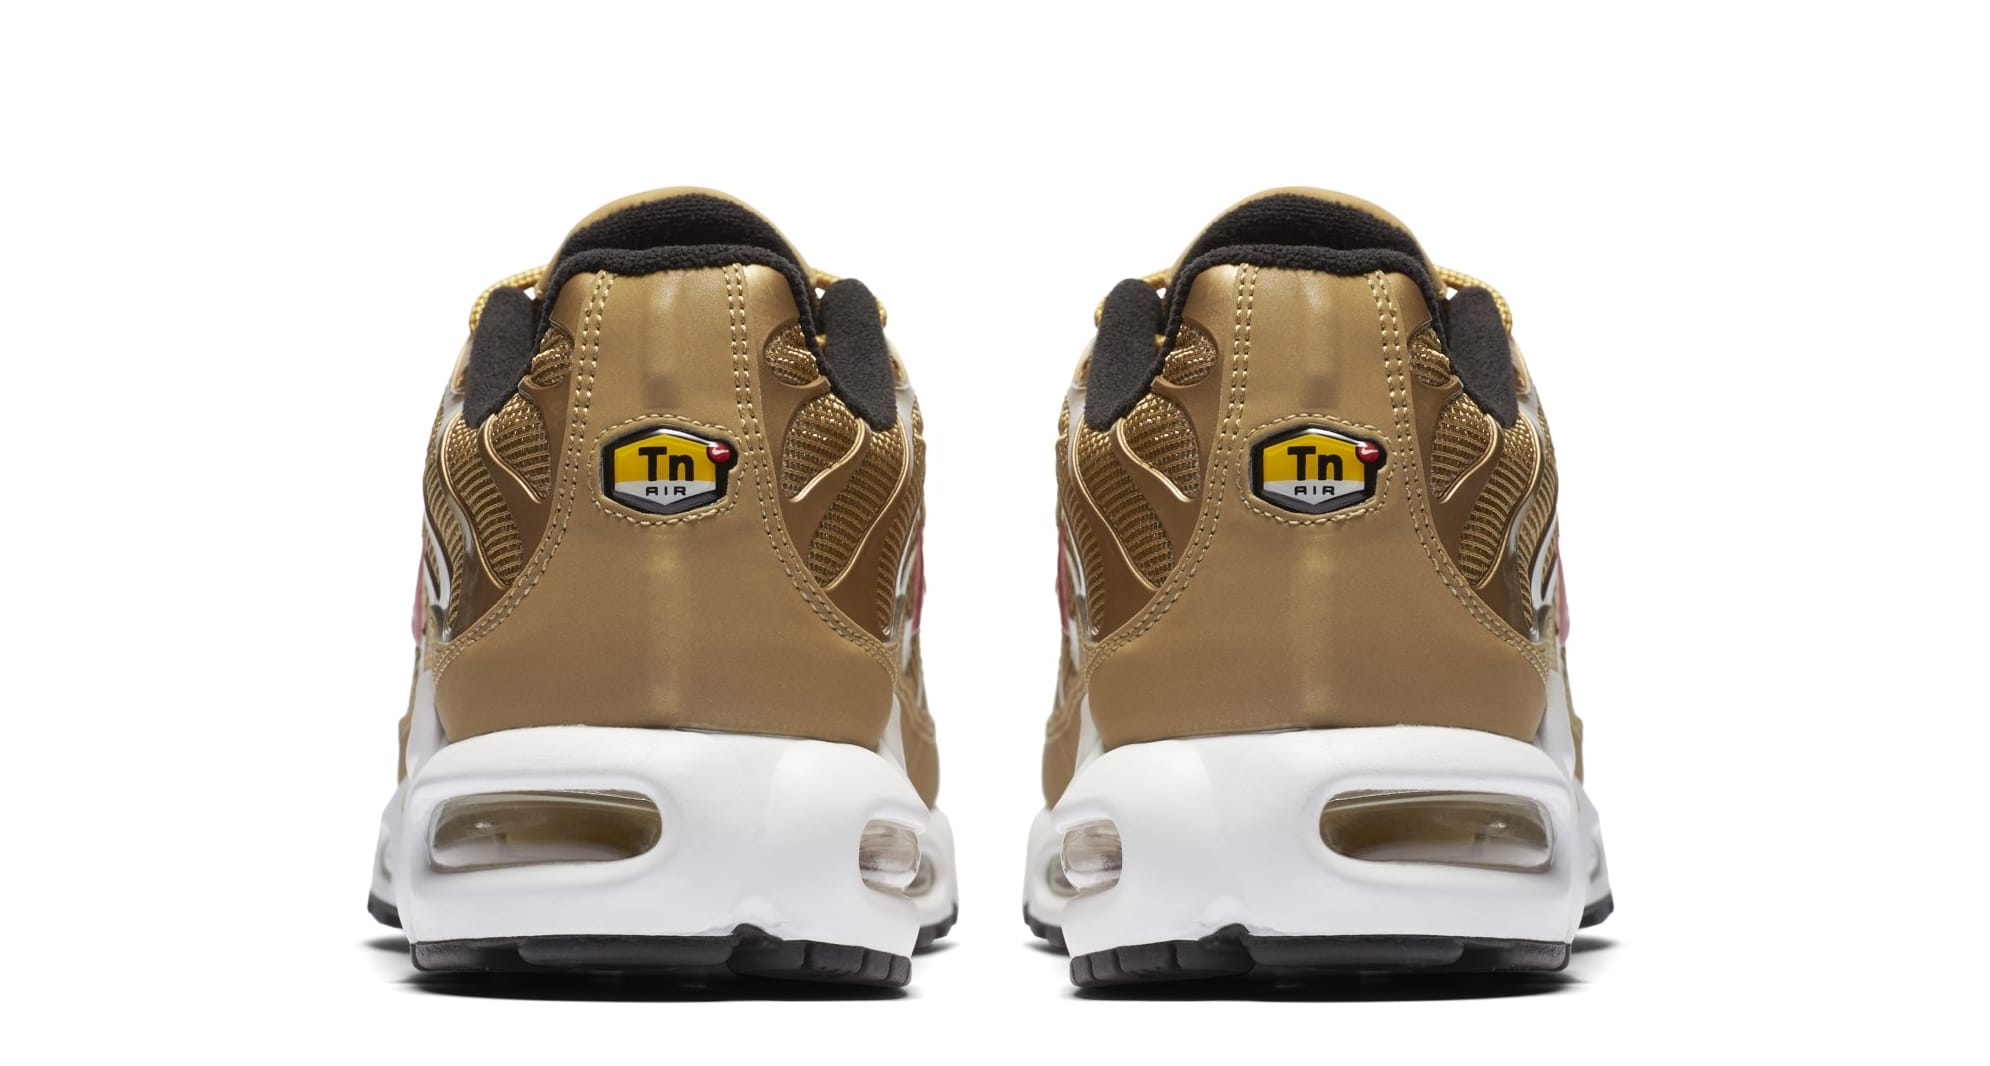 Nike Air Max Plus 'Metallic Gold' 903827-700 (Heel)